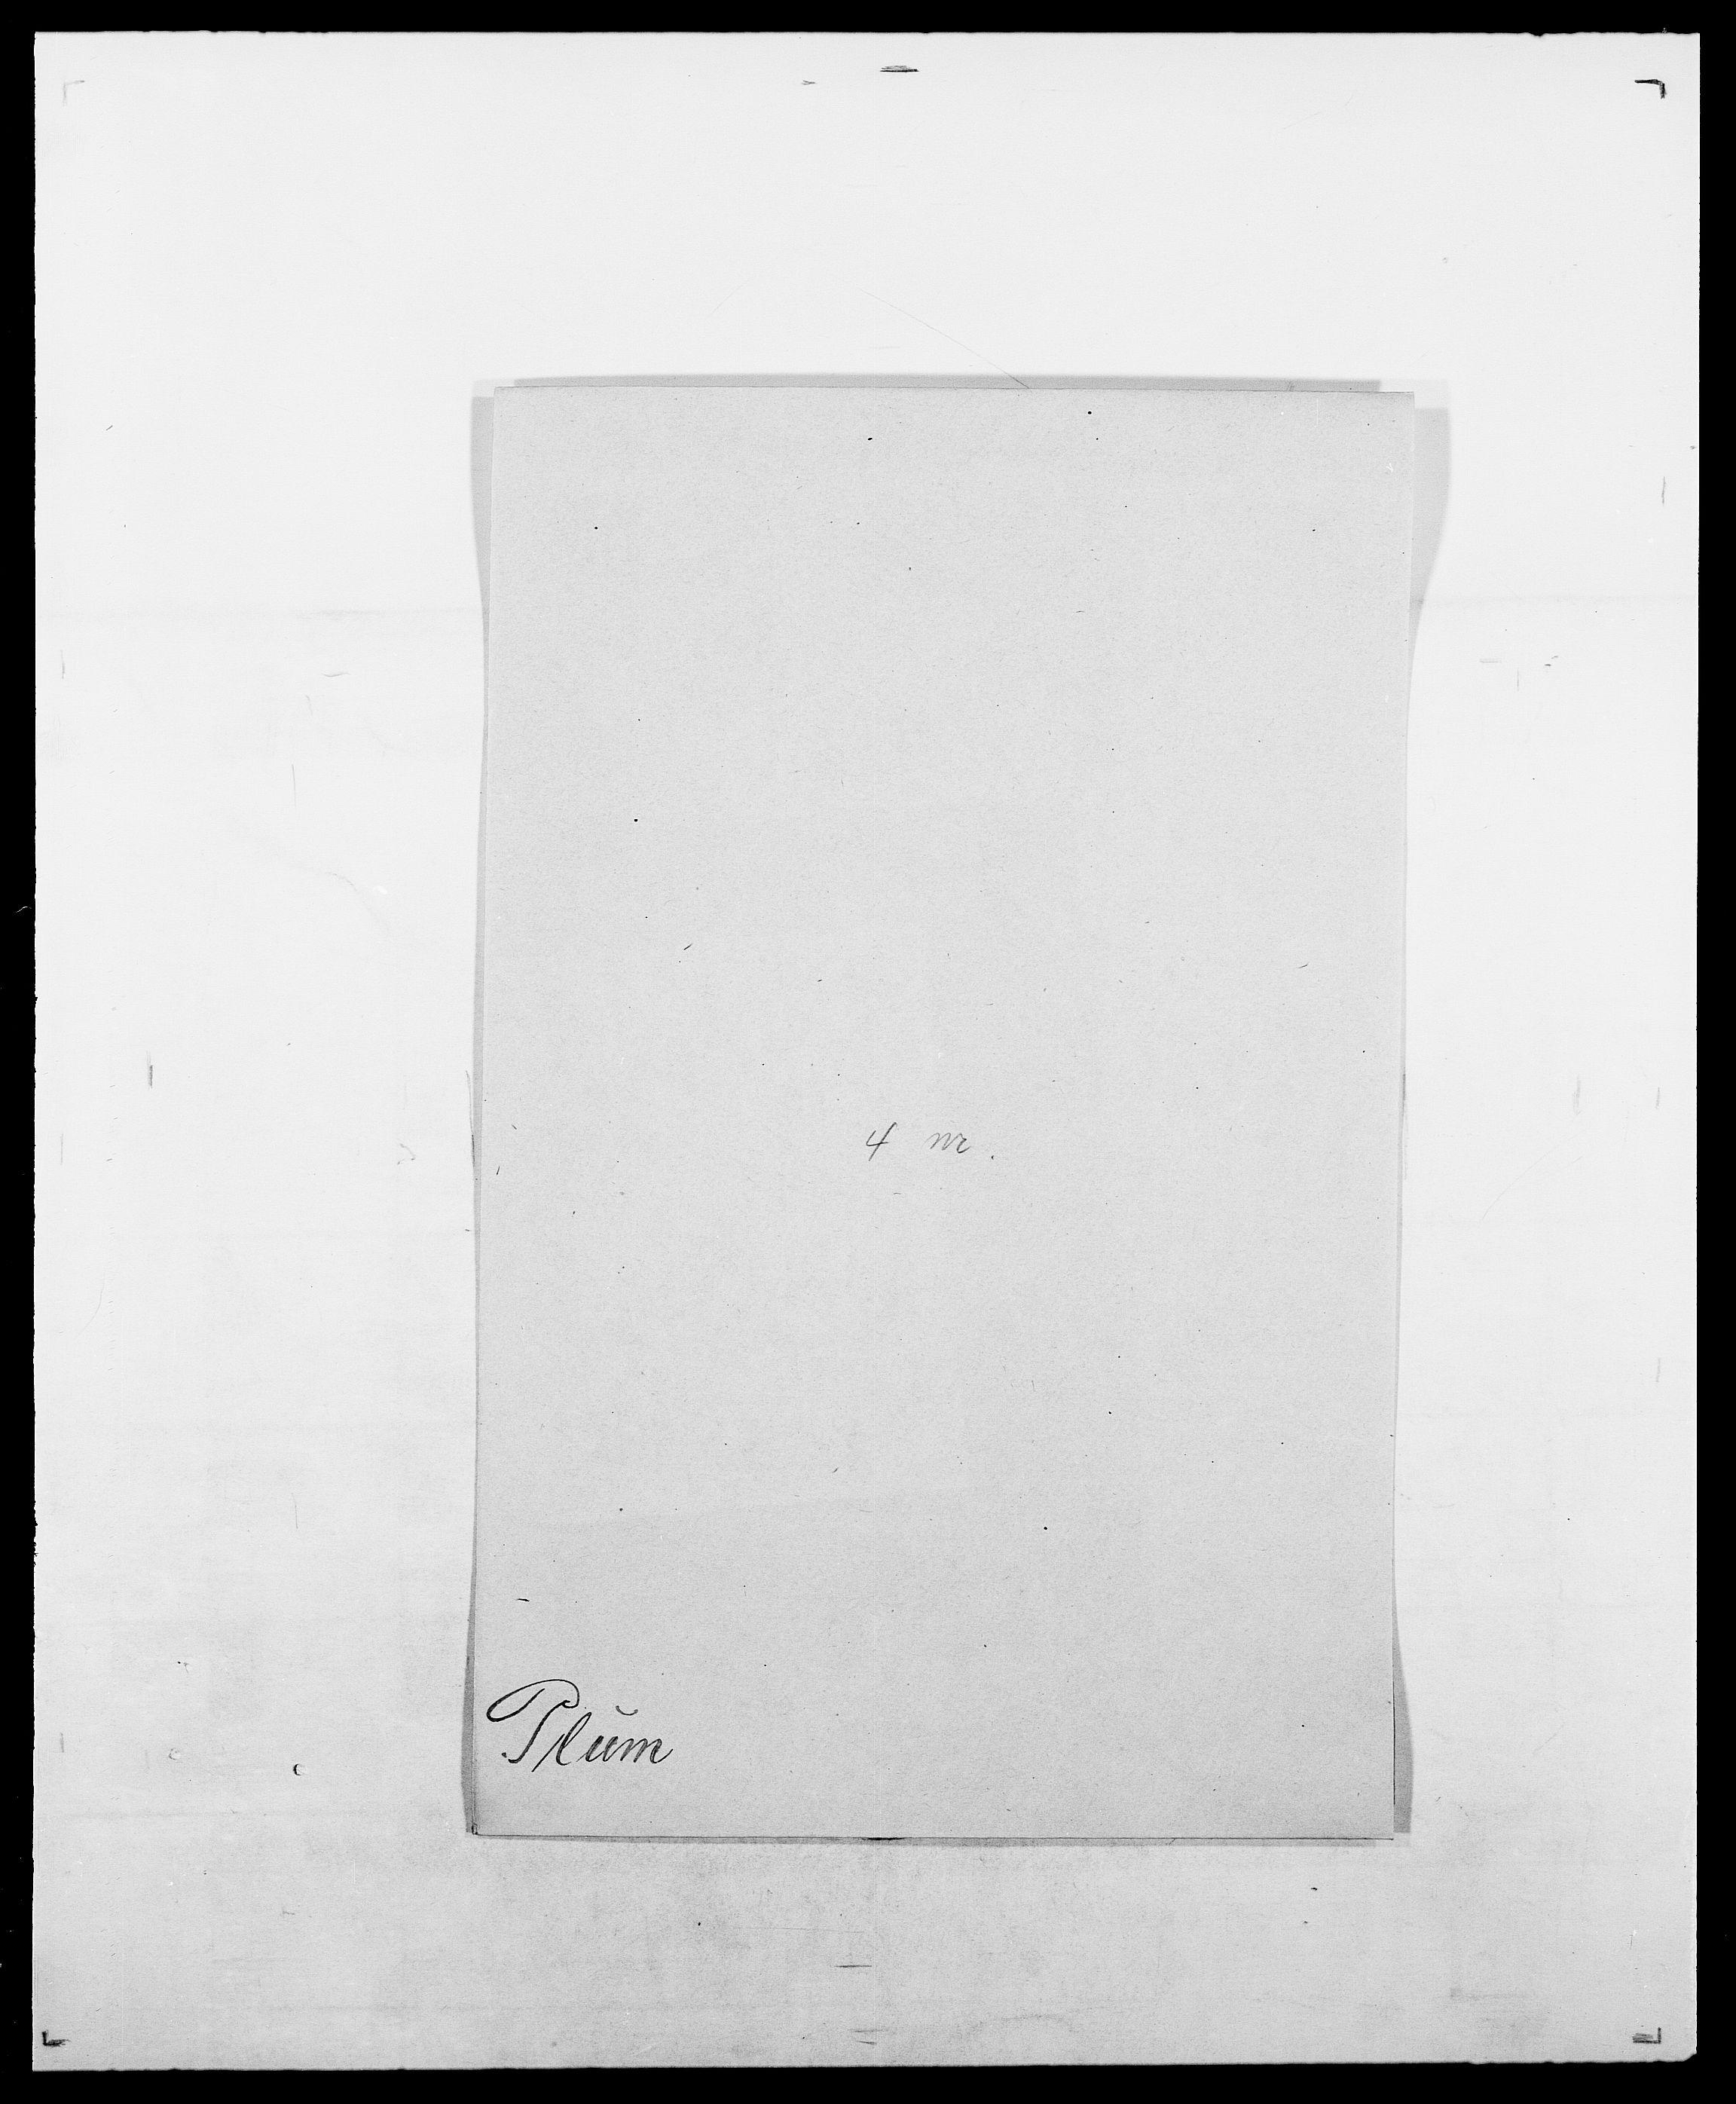 SAO, Delgobe, Charles Antoine - samling, D/Da/L0031: de Place - Raaum, s. 140